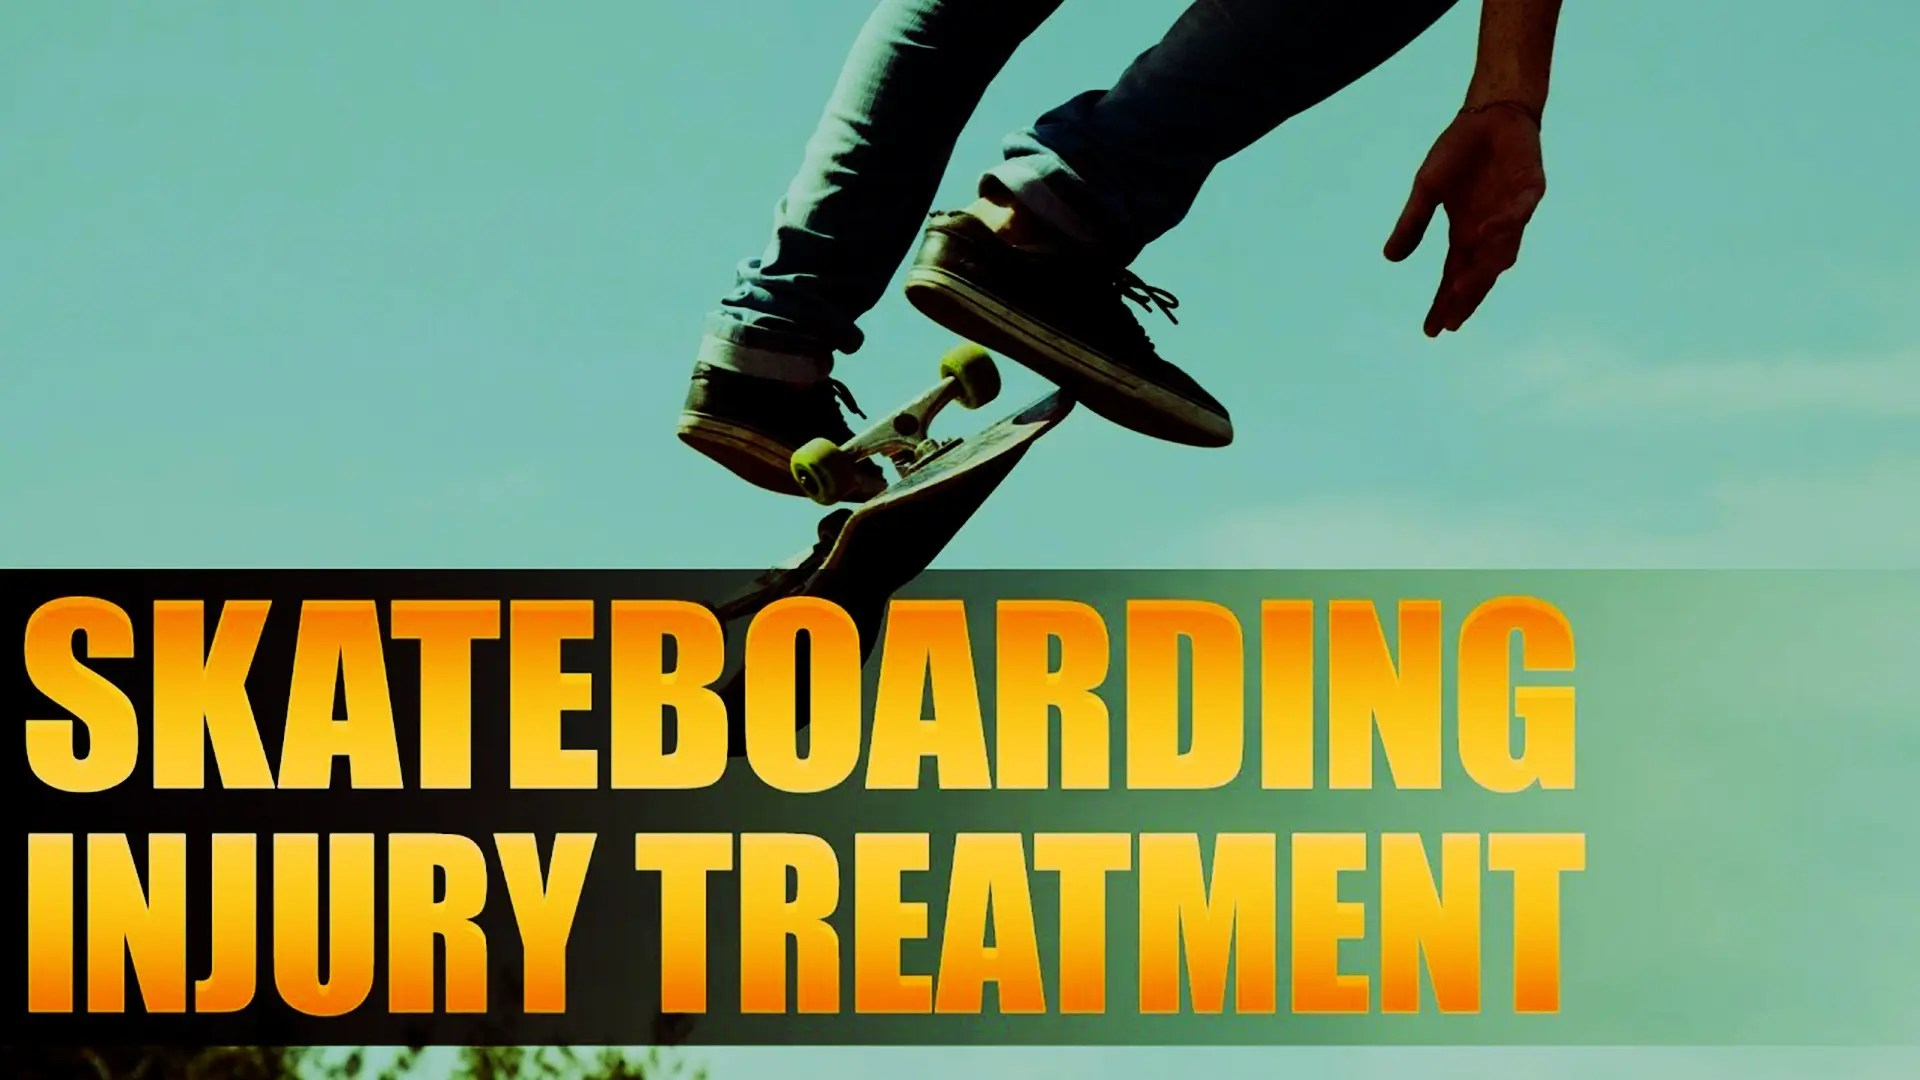 Skateboarding Injury Treatment | El Paso, TX. | Video